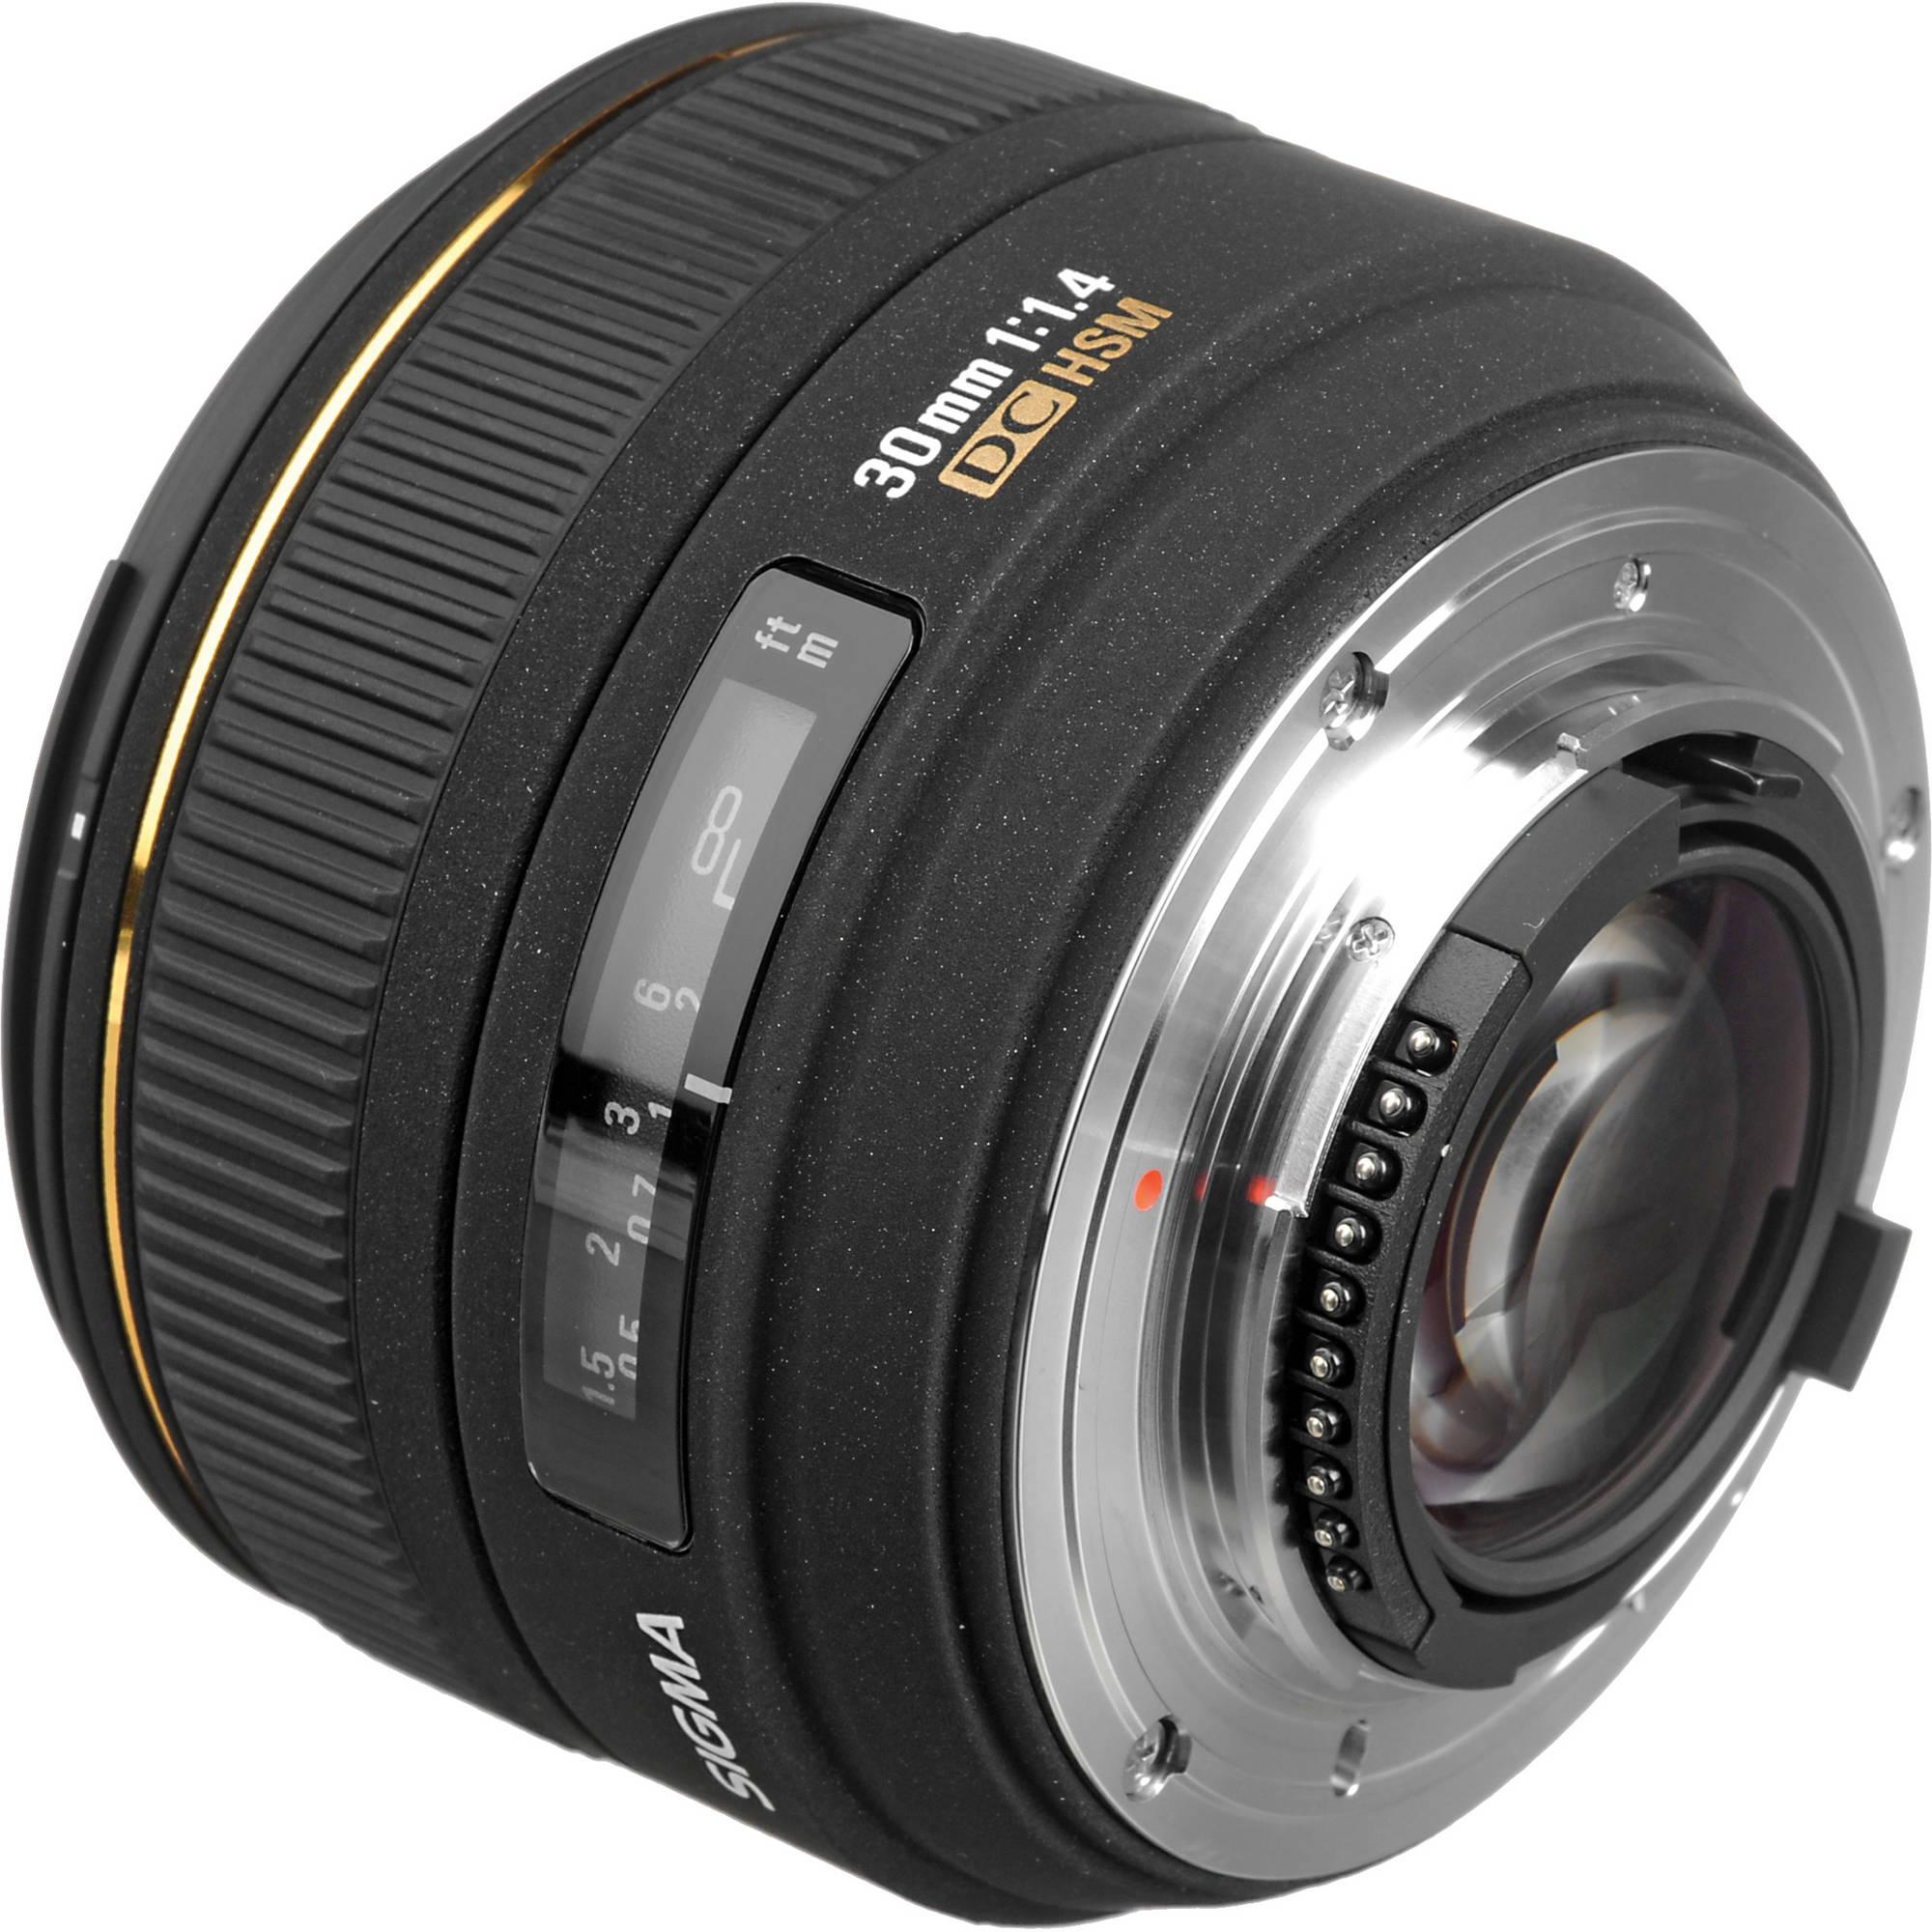 Sigma 30mm f/1 4 EX DC HSM Autofocus Lens for Nikon Digital